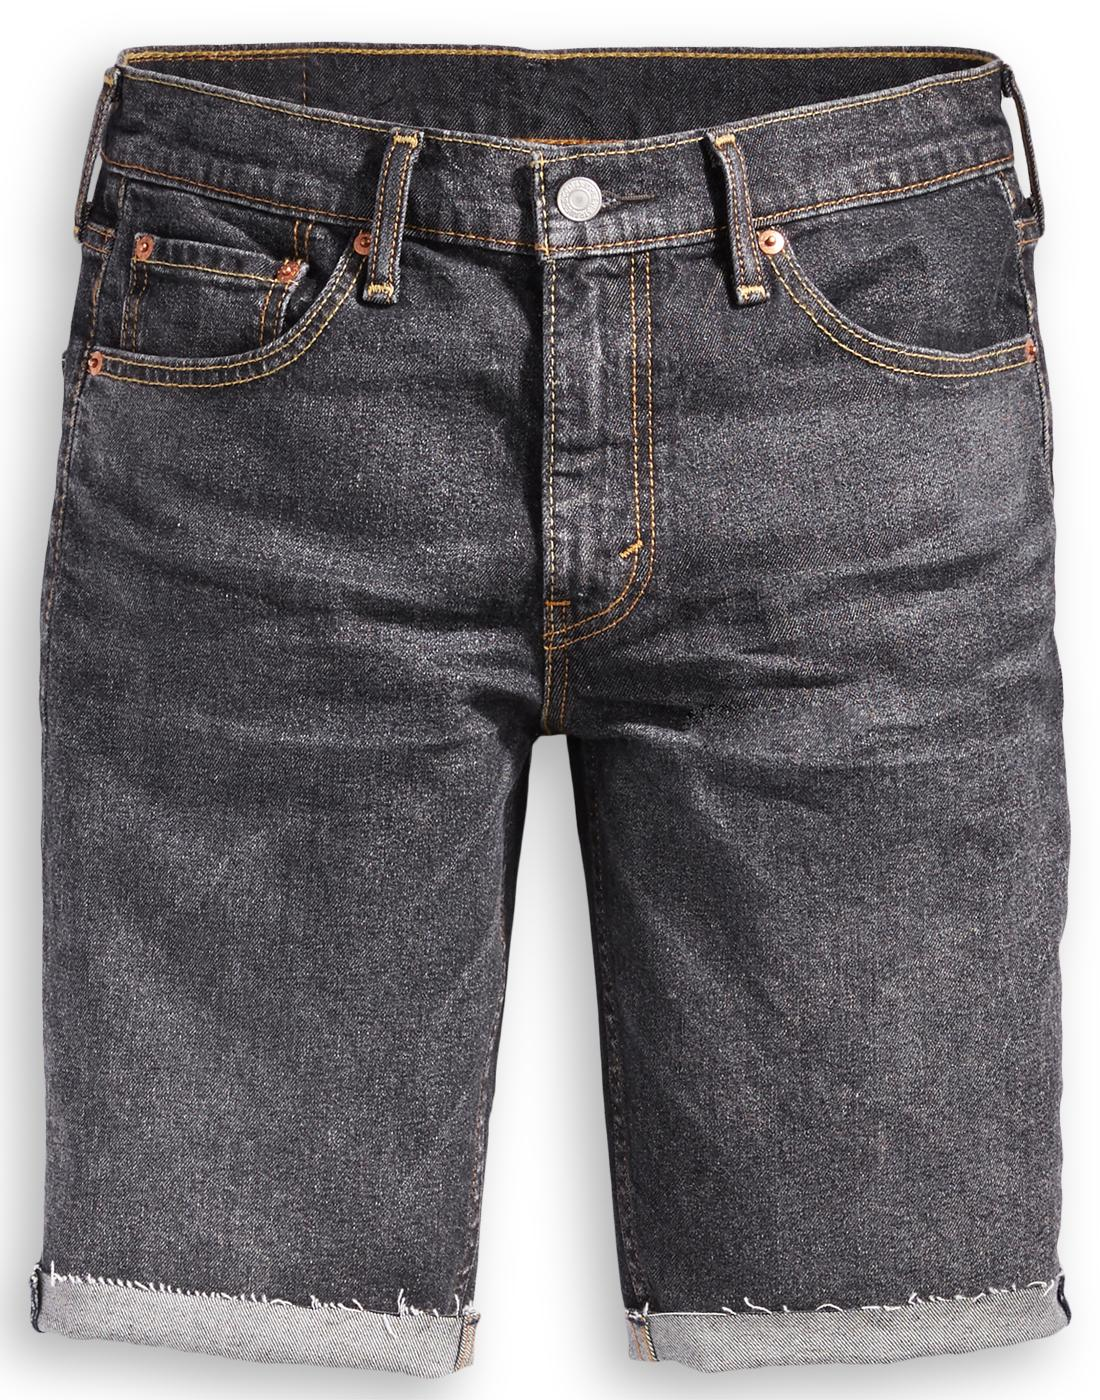 70b2ee76 LEVI'S® 511 Men's Retro Slim Cut Off Denim Shorts in Bloke